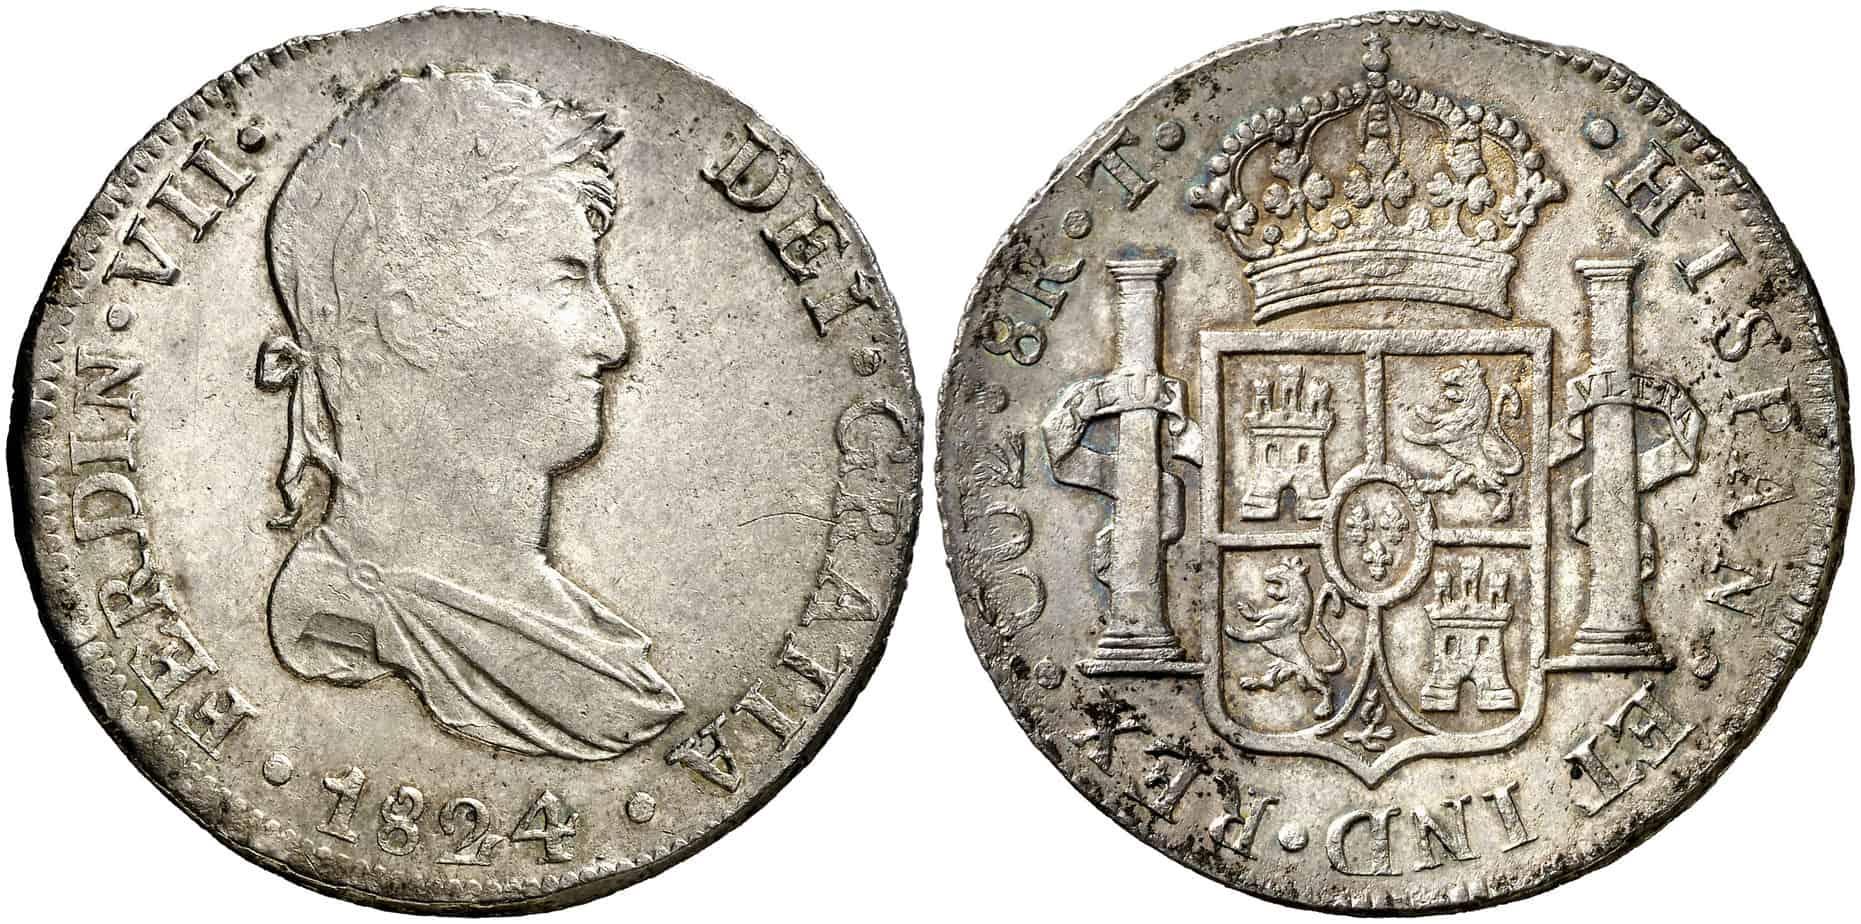 8 reales Cuzco 1824 T